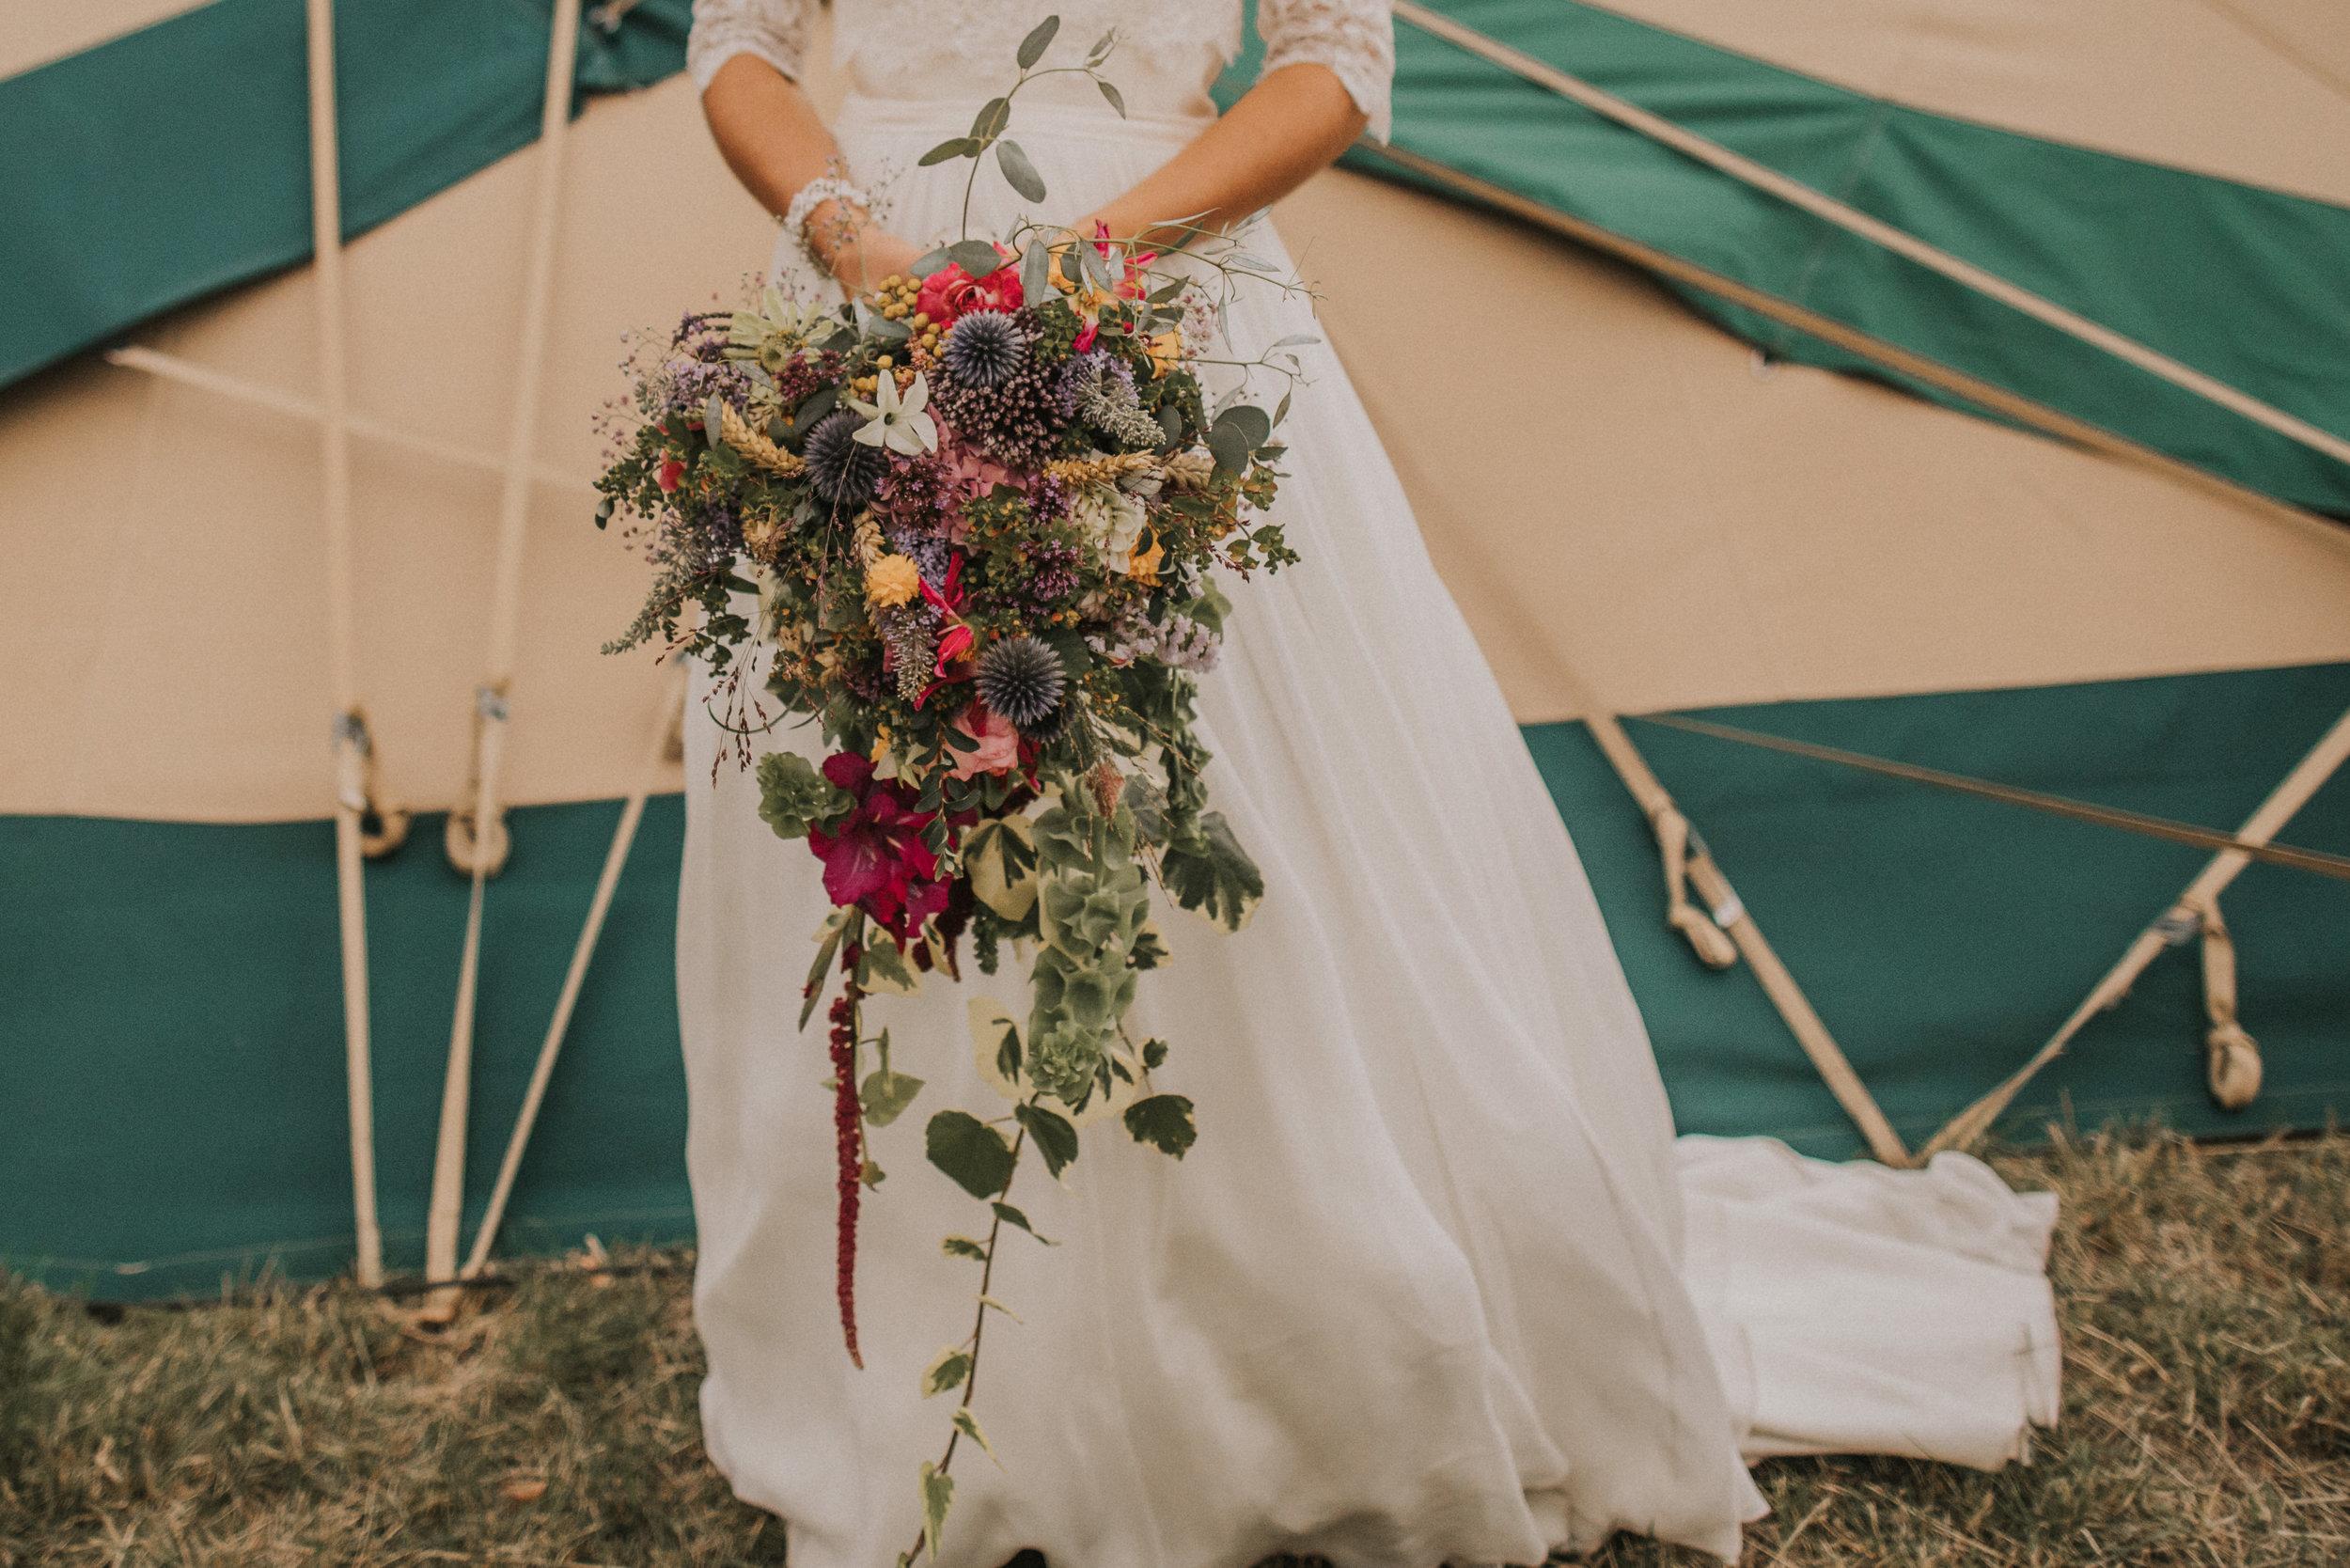 brook rose photography  Farm wedding_113.jpg